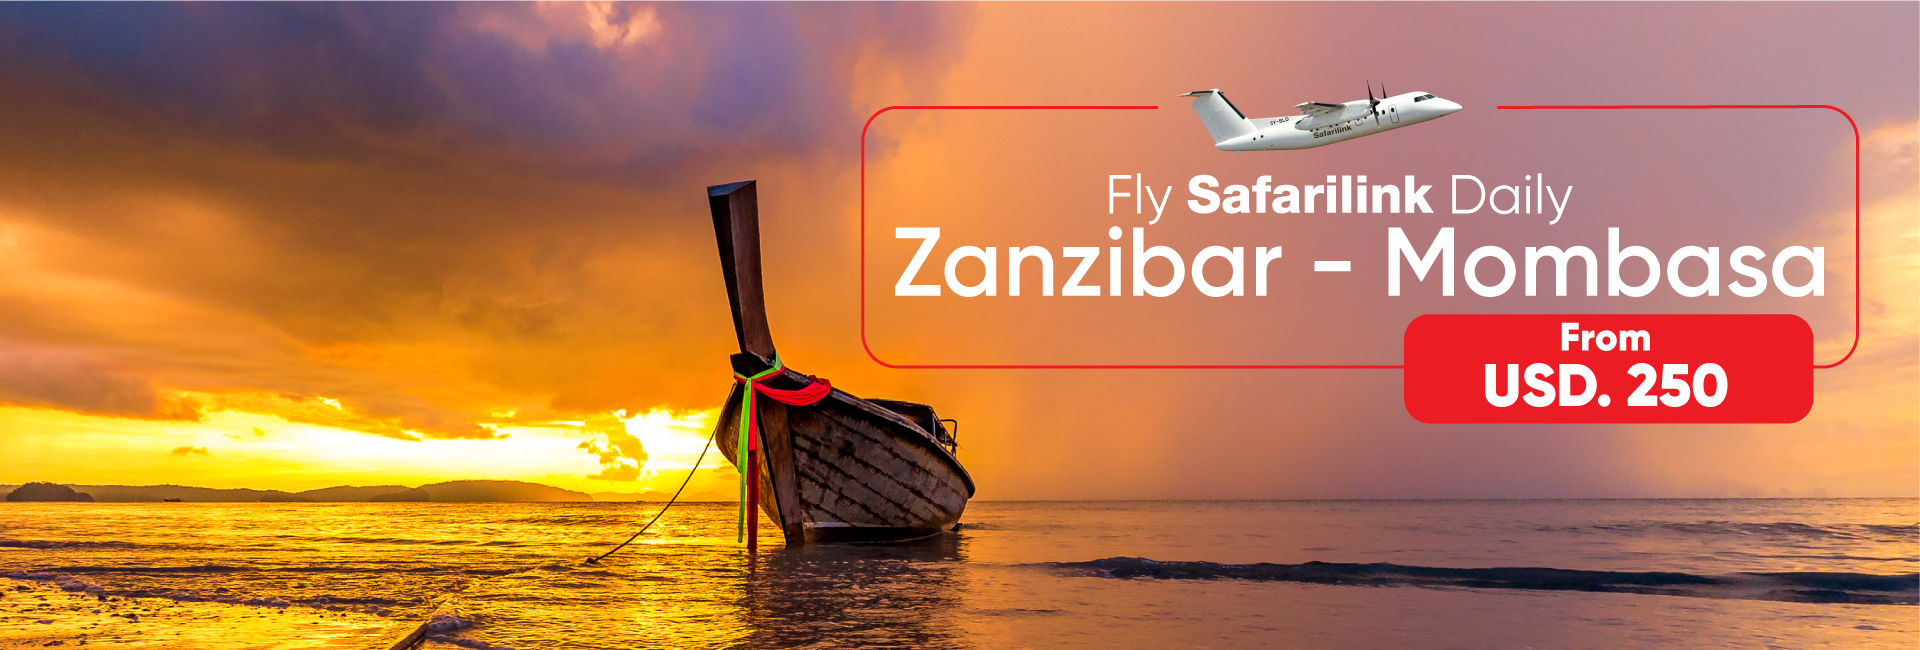 fly safarilink daily from Zanzibar Island To Mombasa